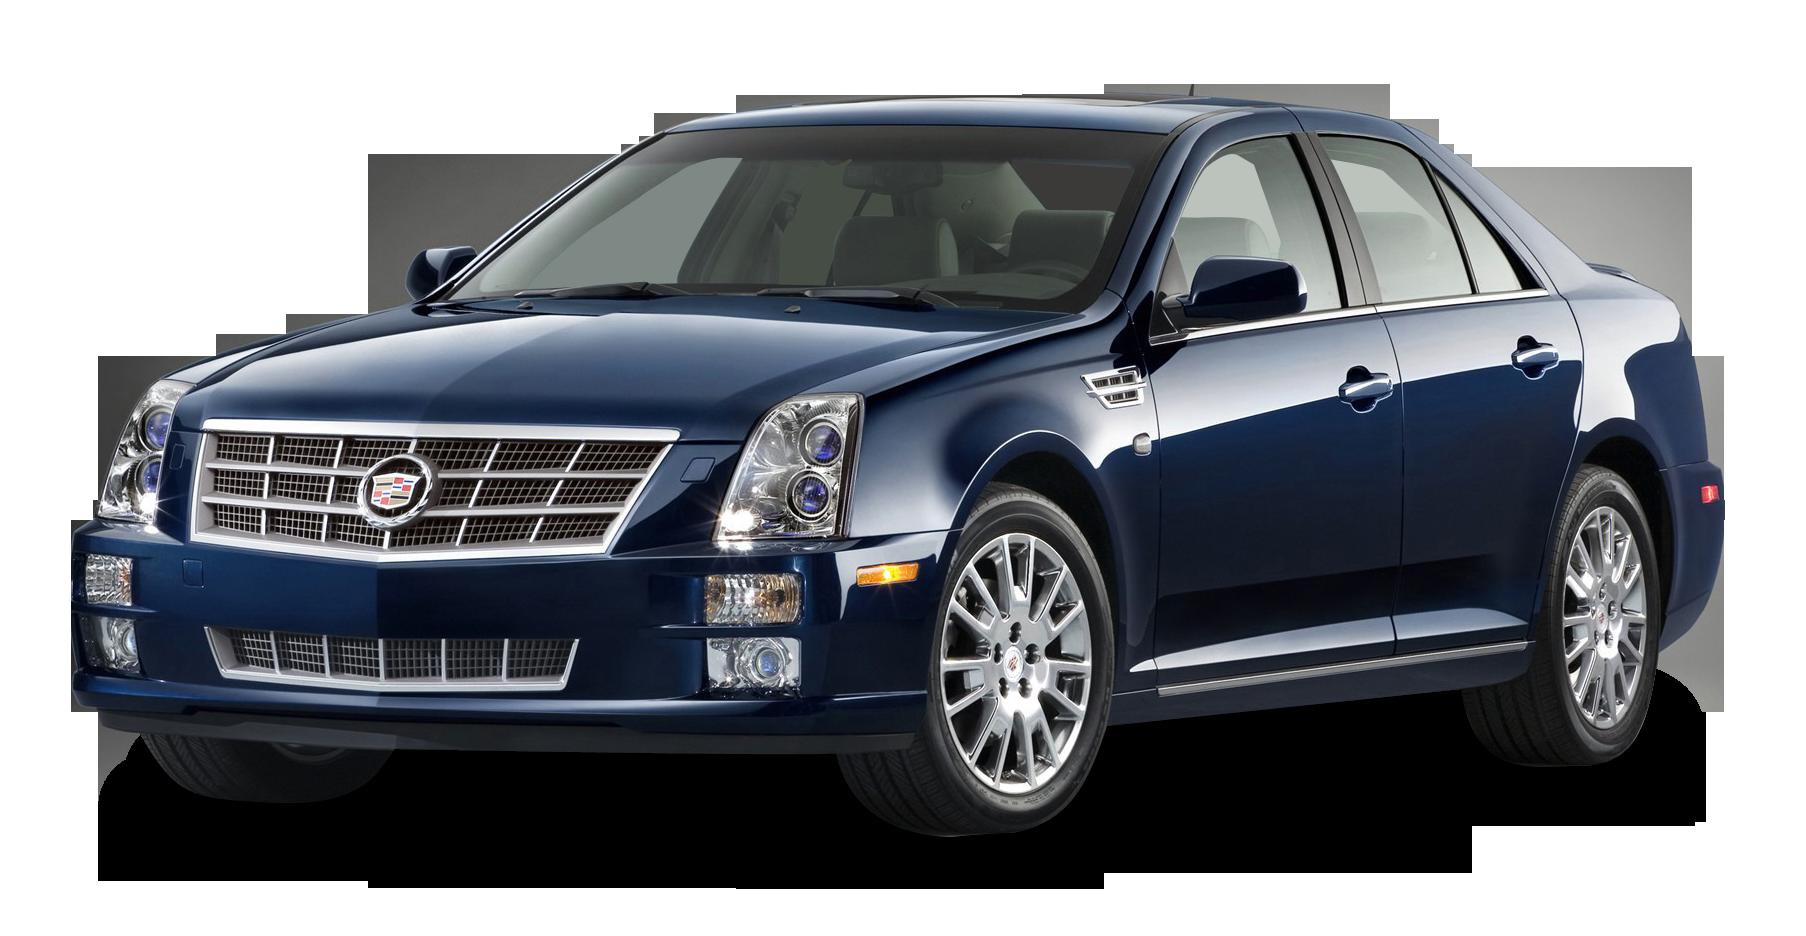 Cadillac STS Blue Car PNG Image